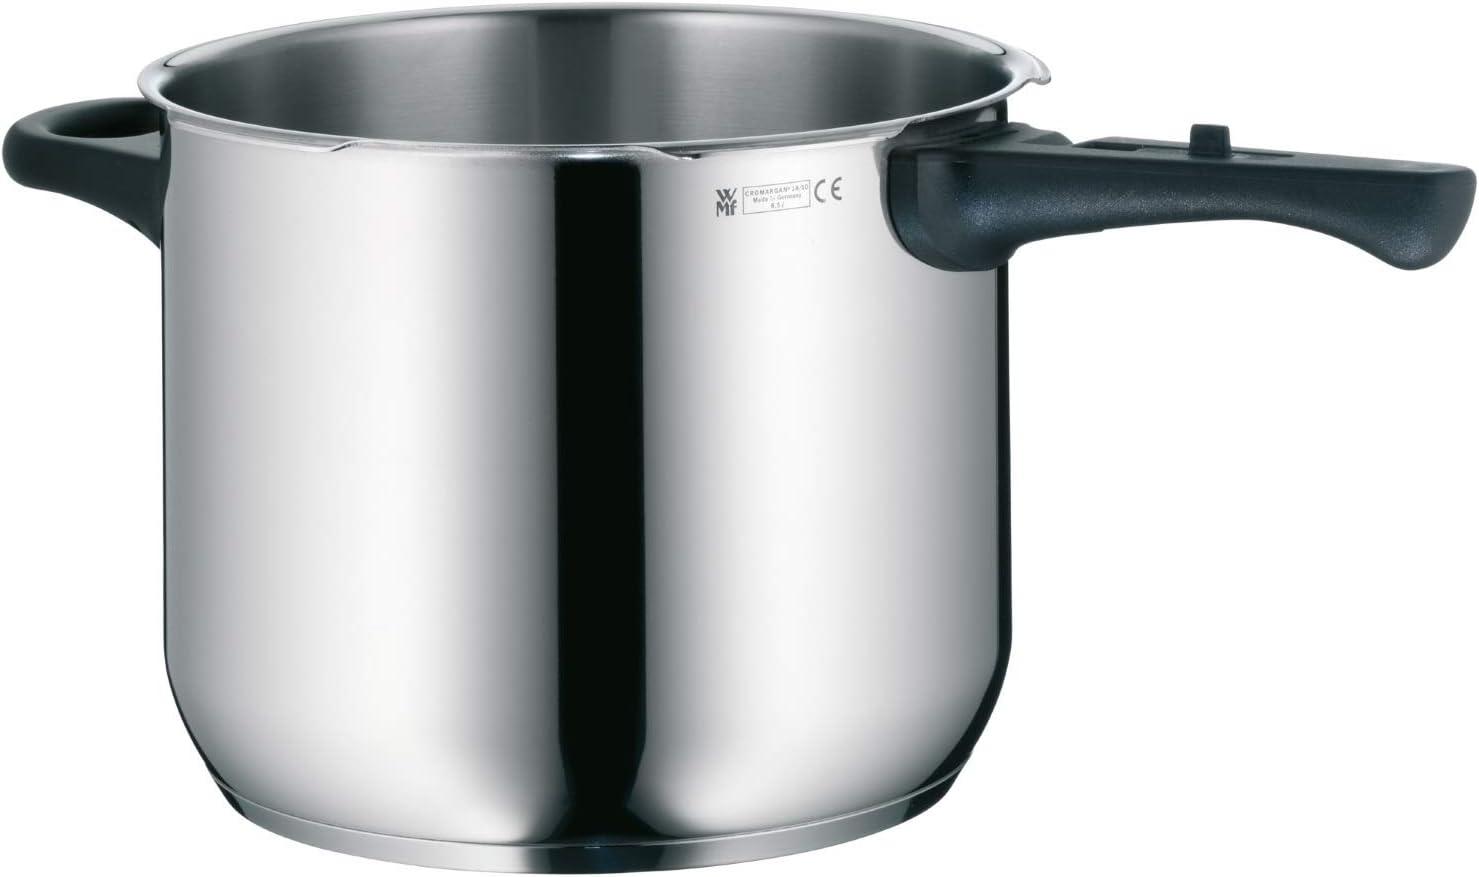 WMF Perfect 0792136041 Pressure Cooker 6.5 L